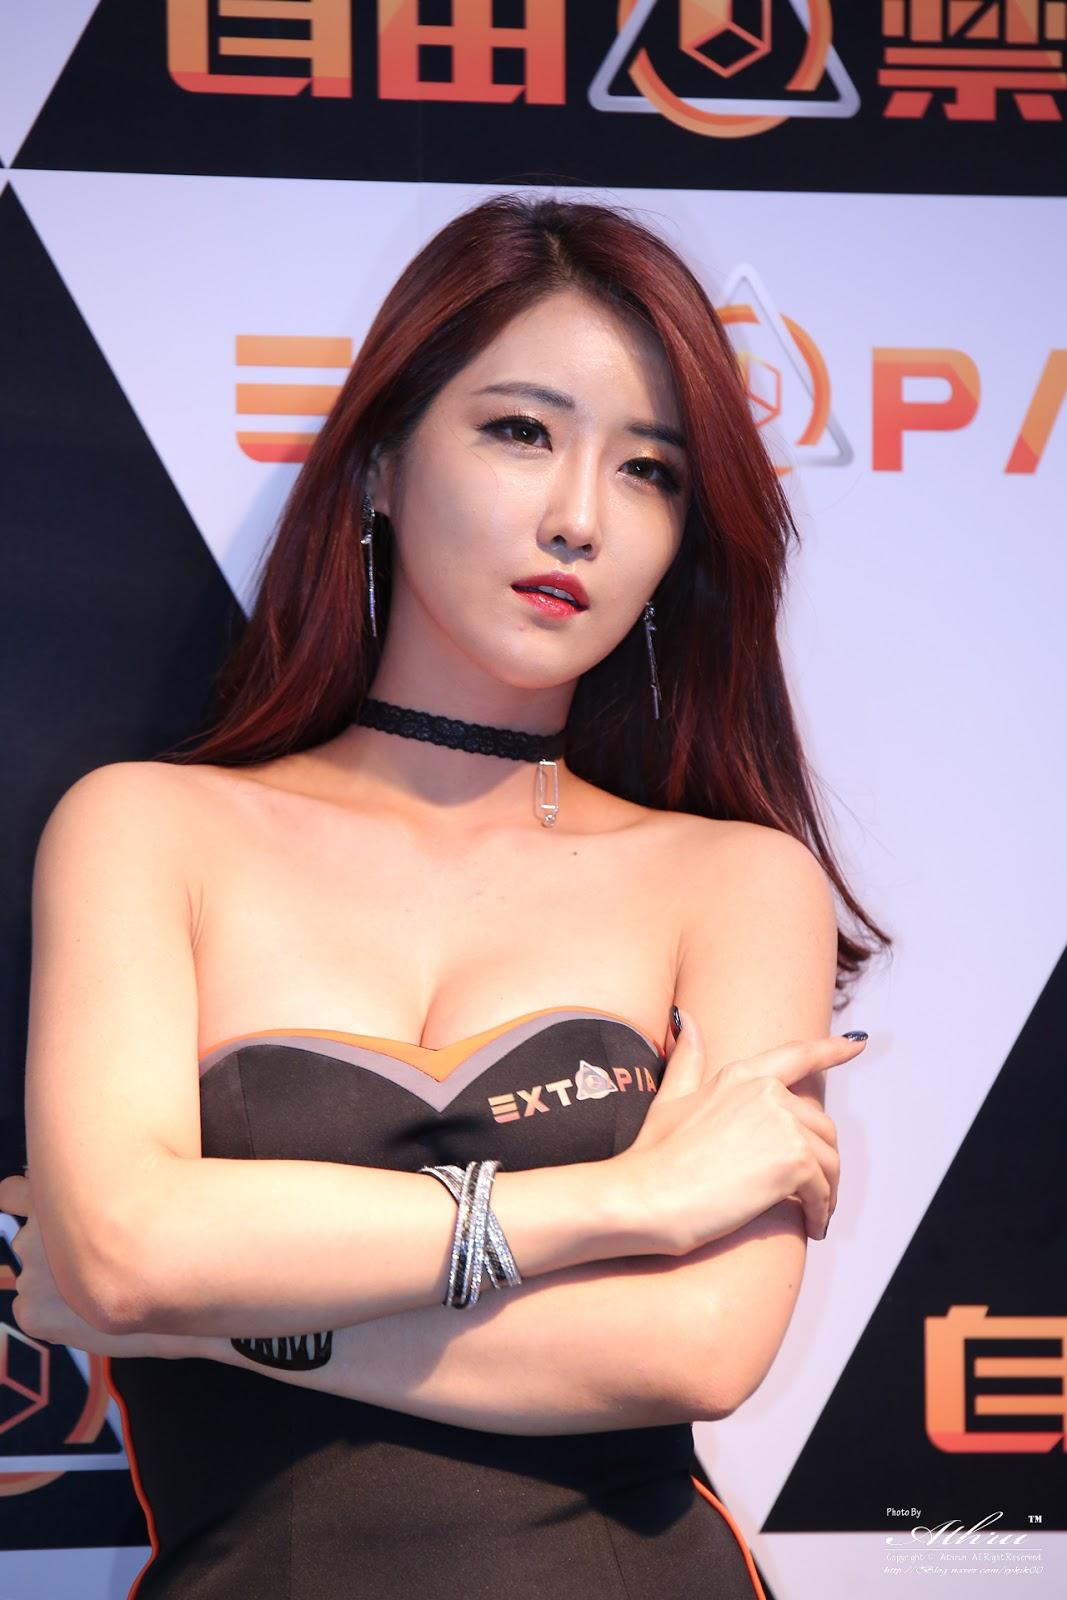 Celeb side boob